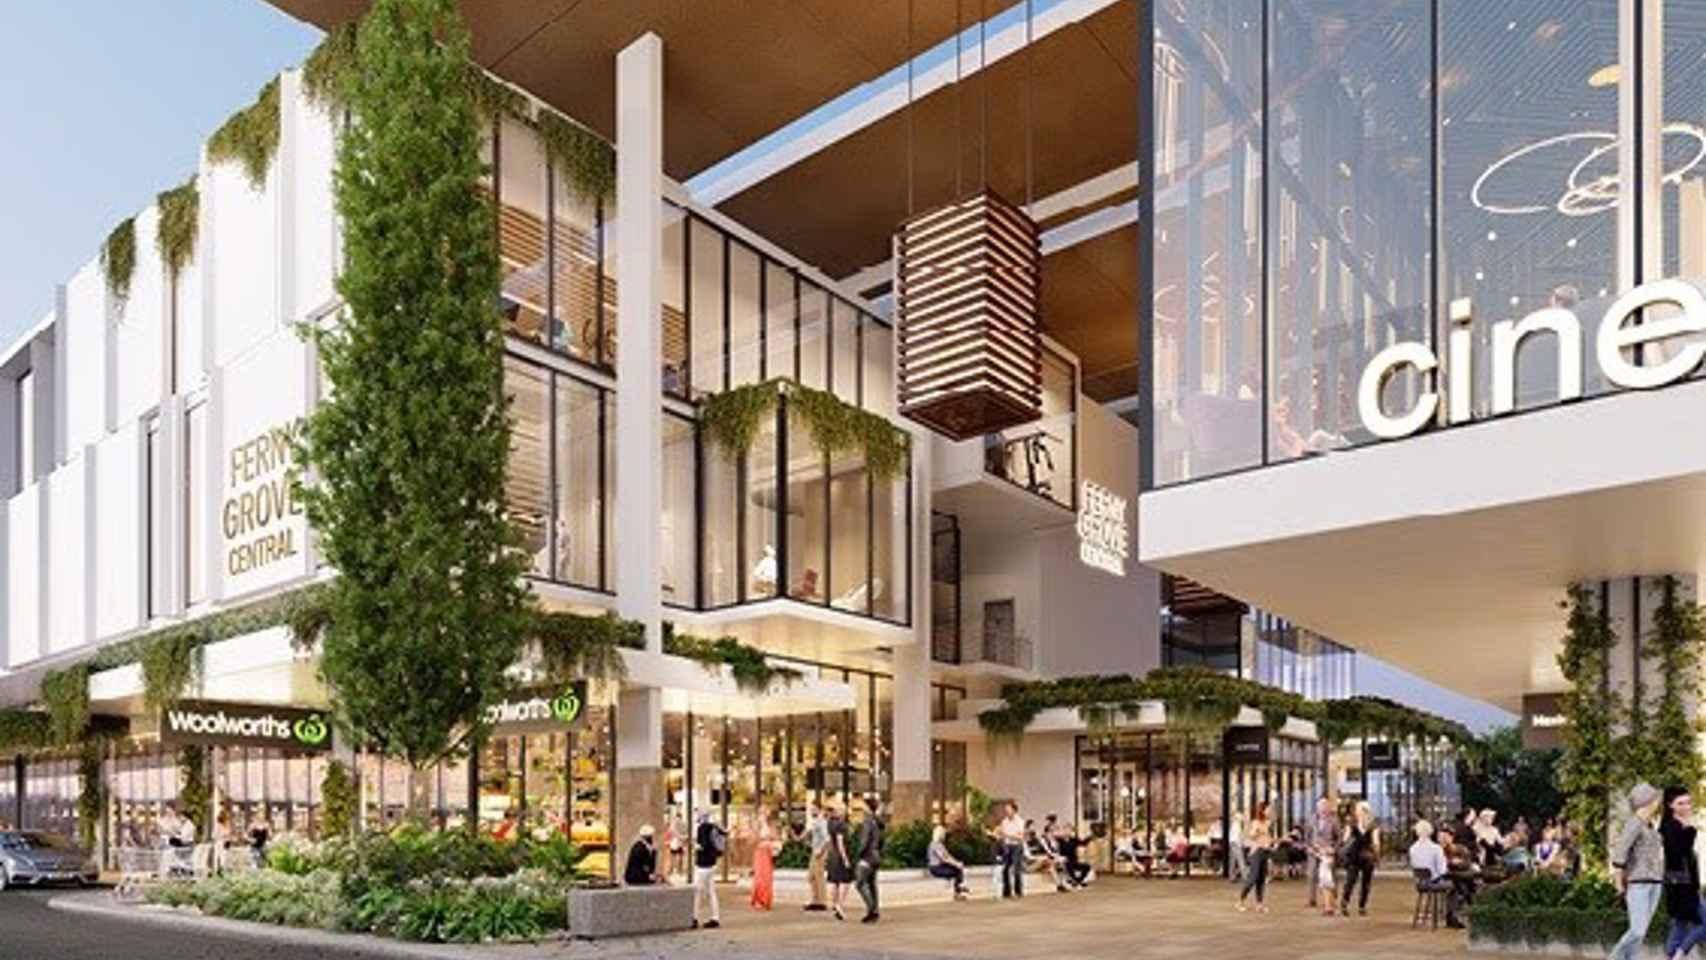 Cimic (ACS) construirá un centro residencial y de ocio en Australia por 65 millones de euros